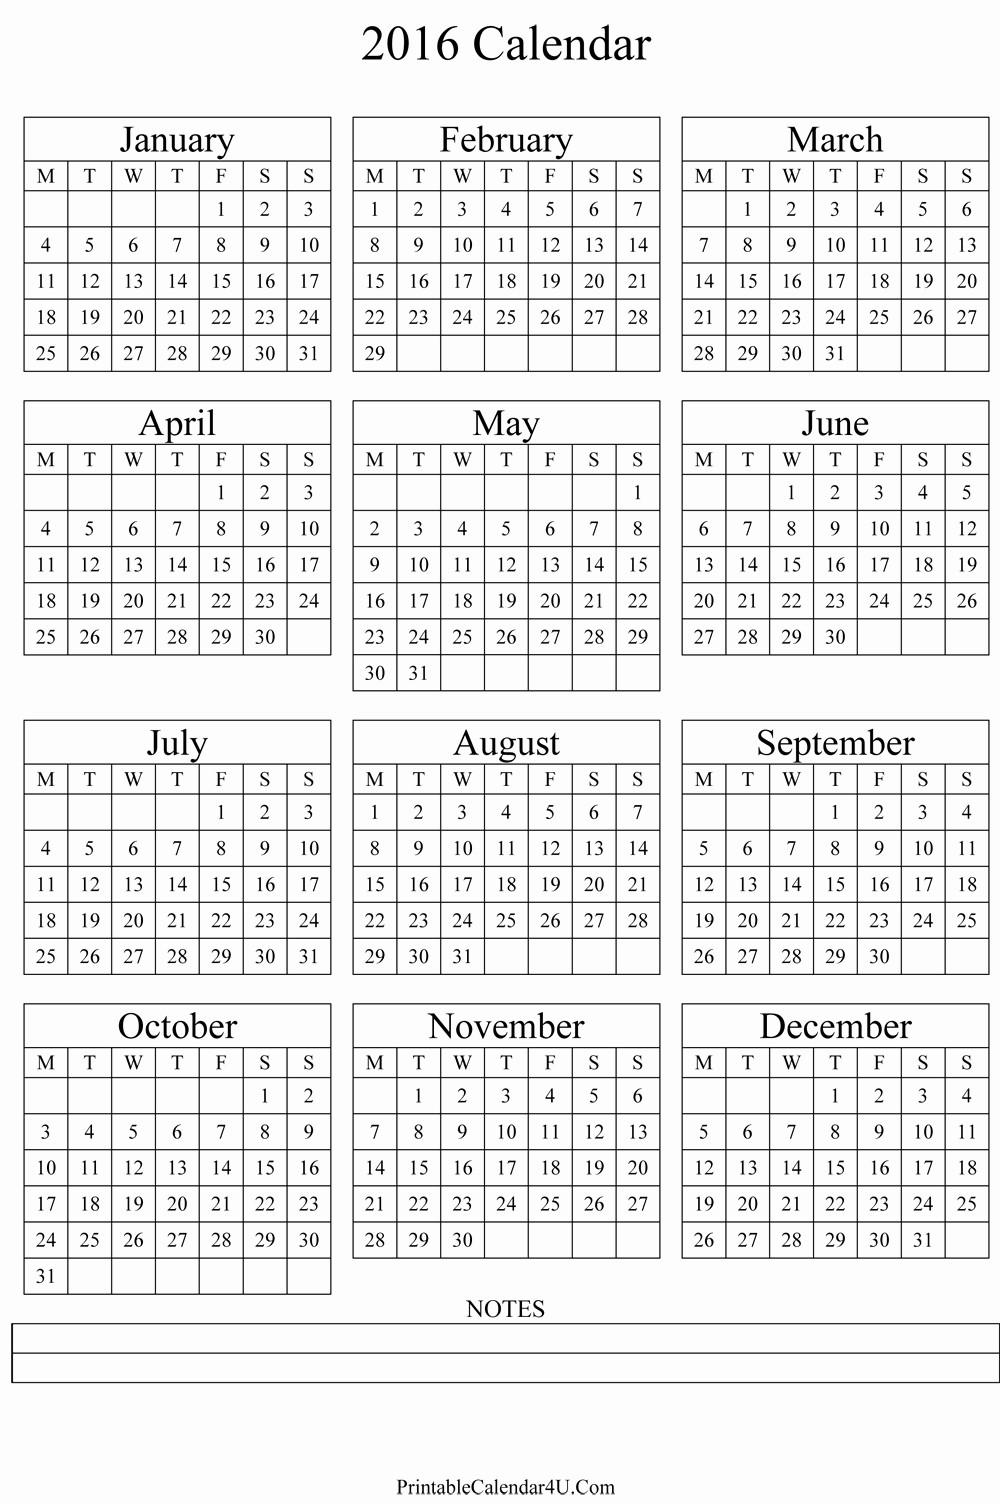 5 Year Calendar Starting 2016 Lovely Annual Calendar 2016 Portrait Printable Calendar 2019 2020